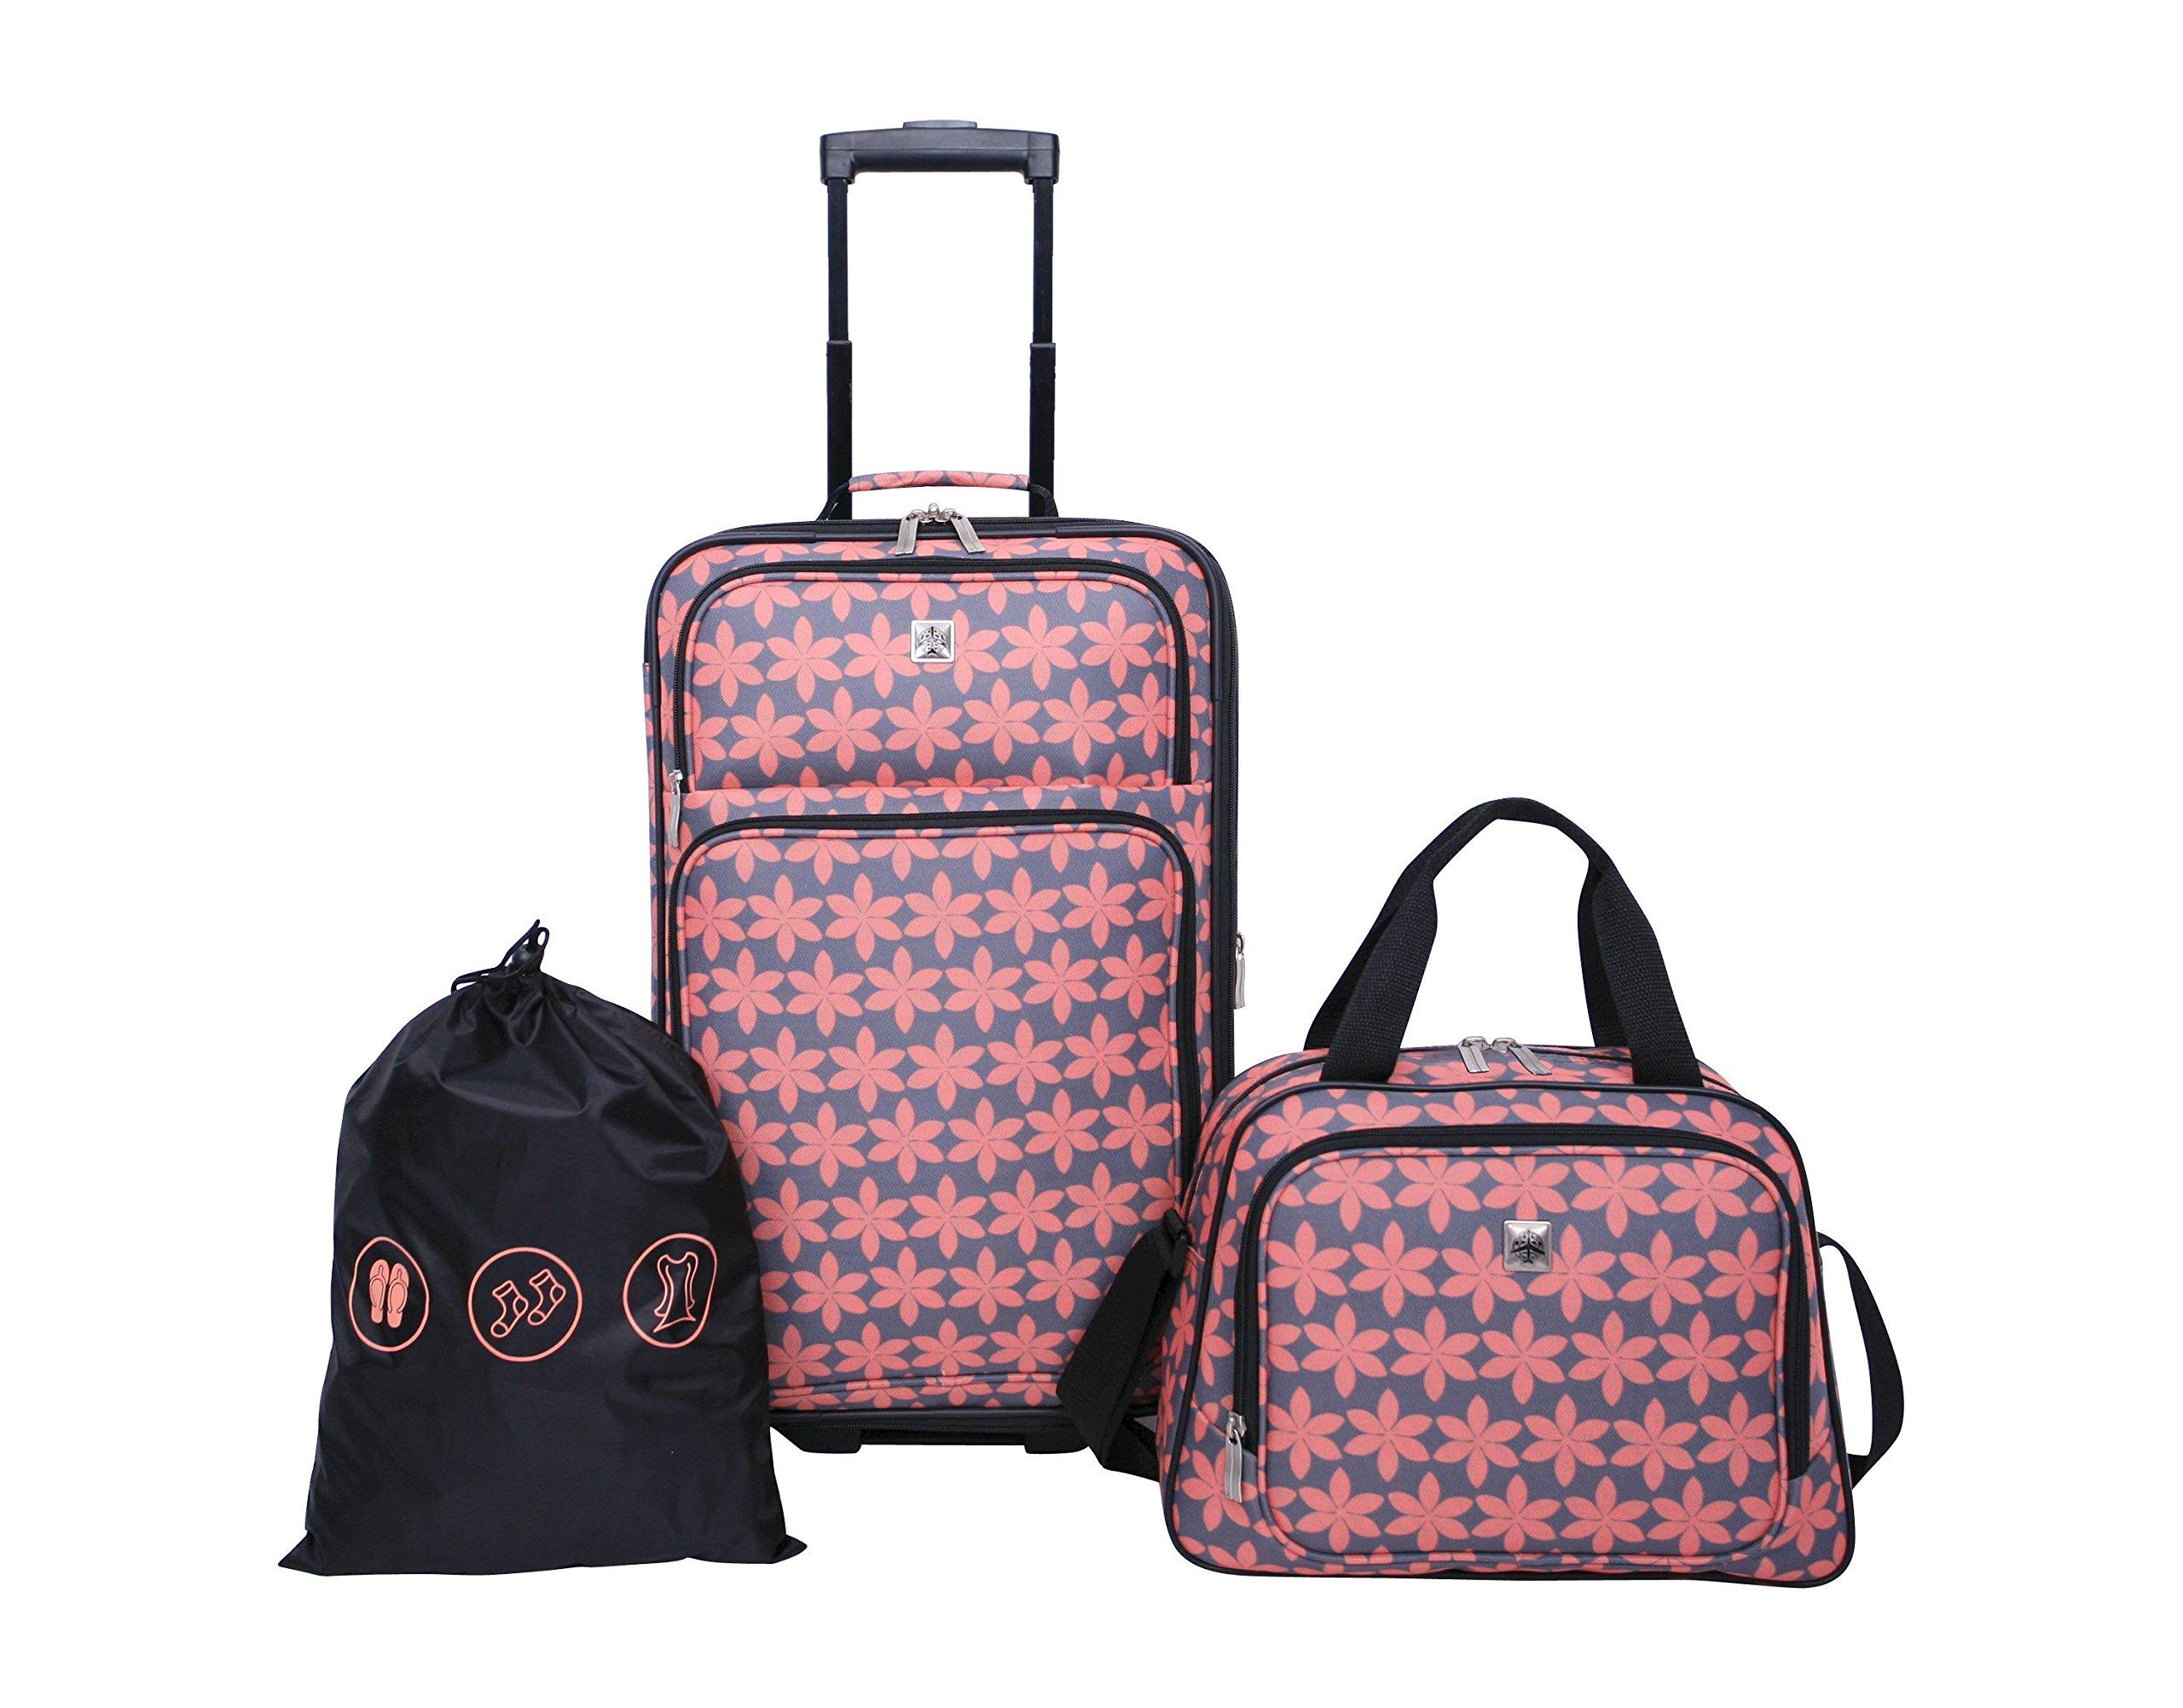 Skyline 3pc Softside Luggage Set - Gray Floral Print